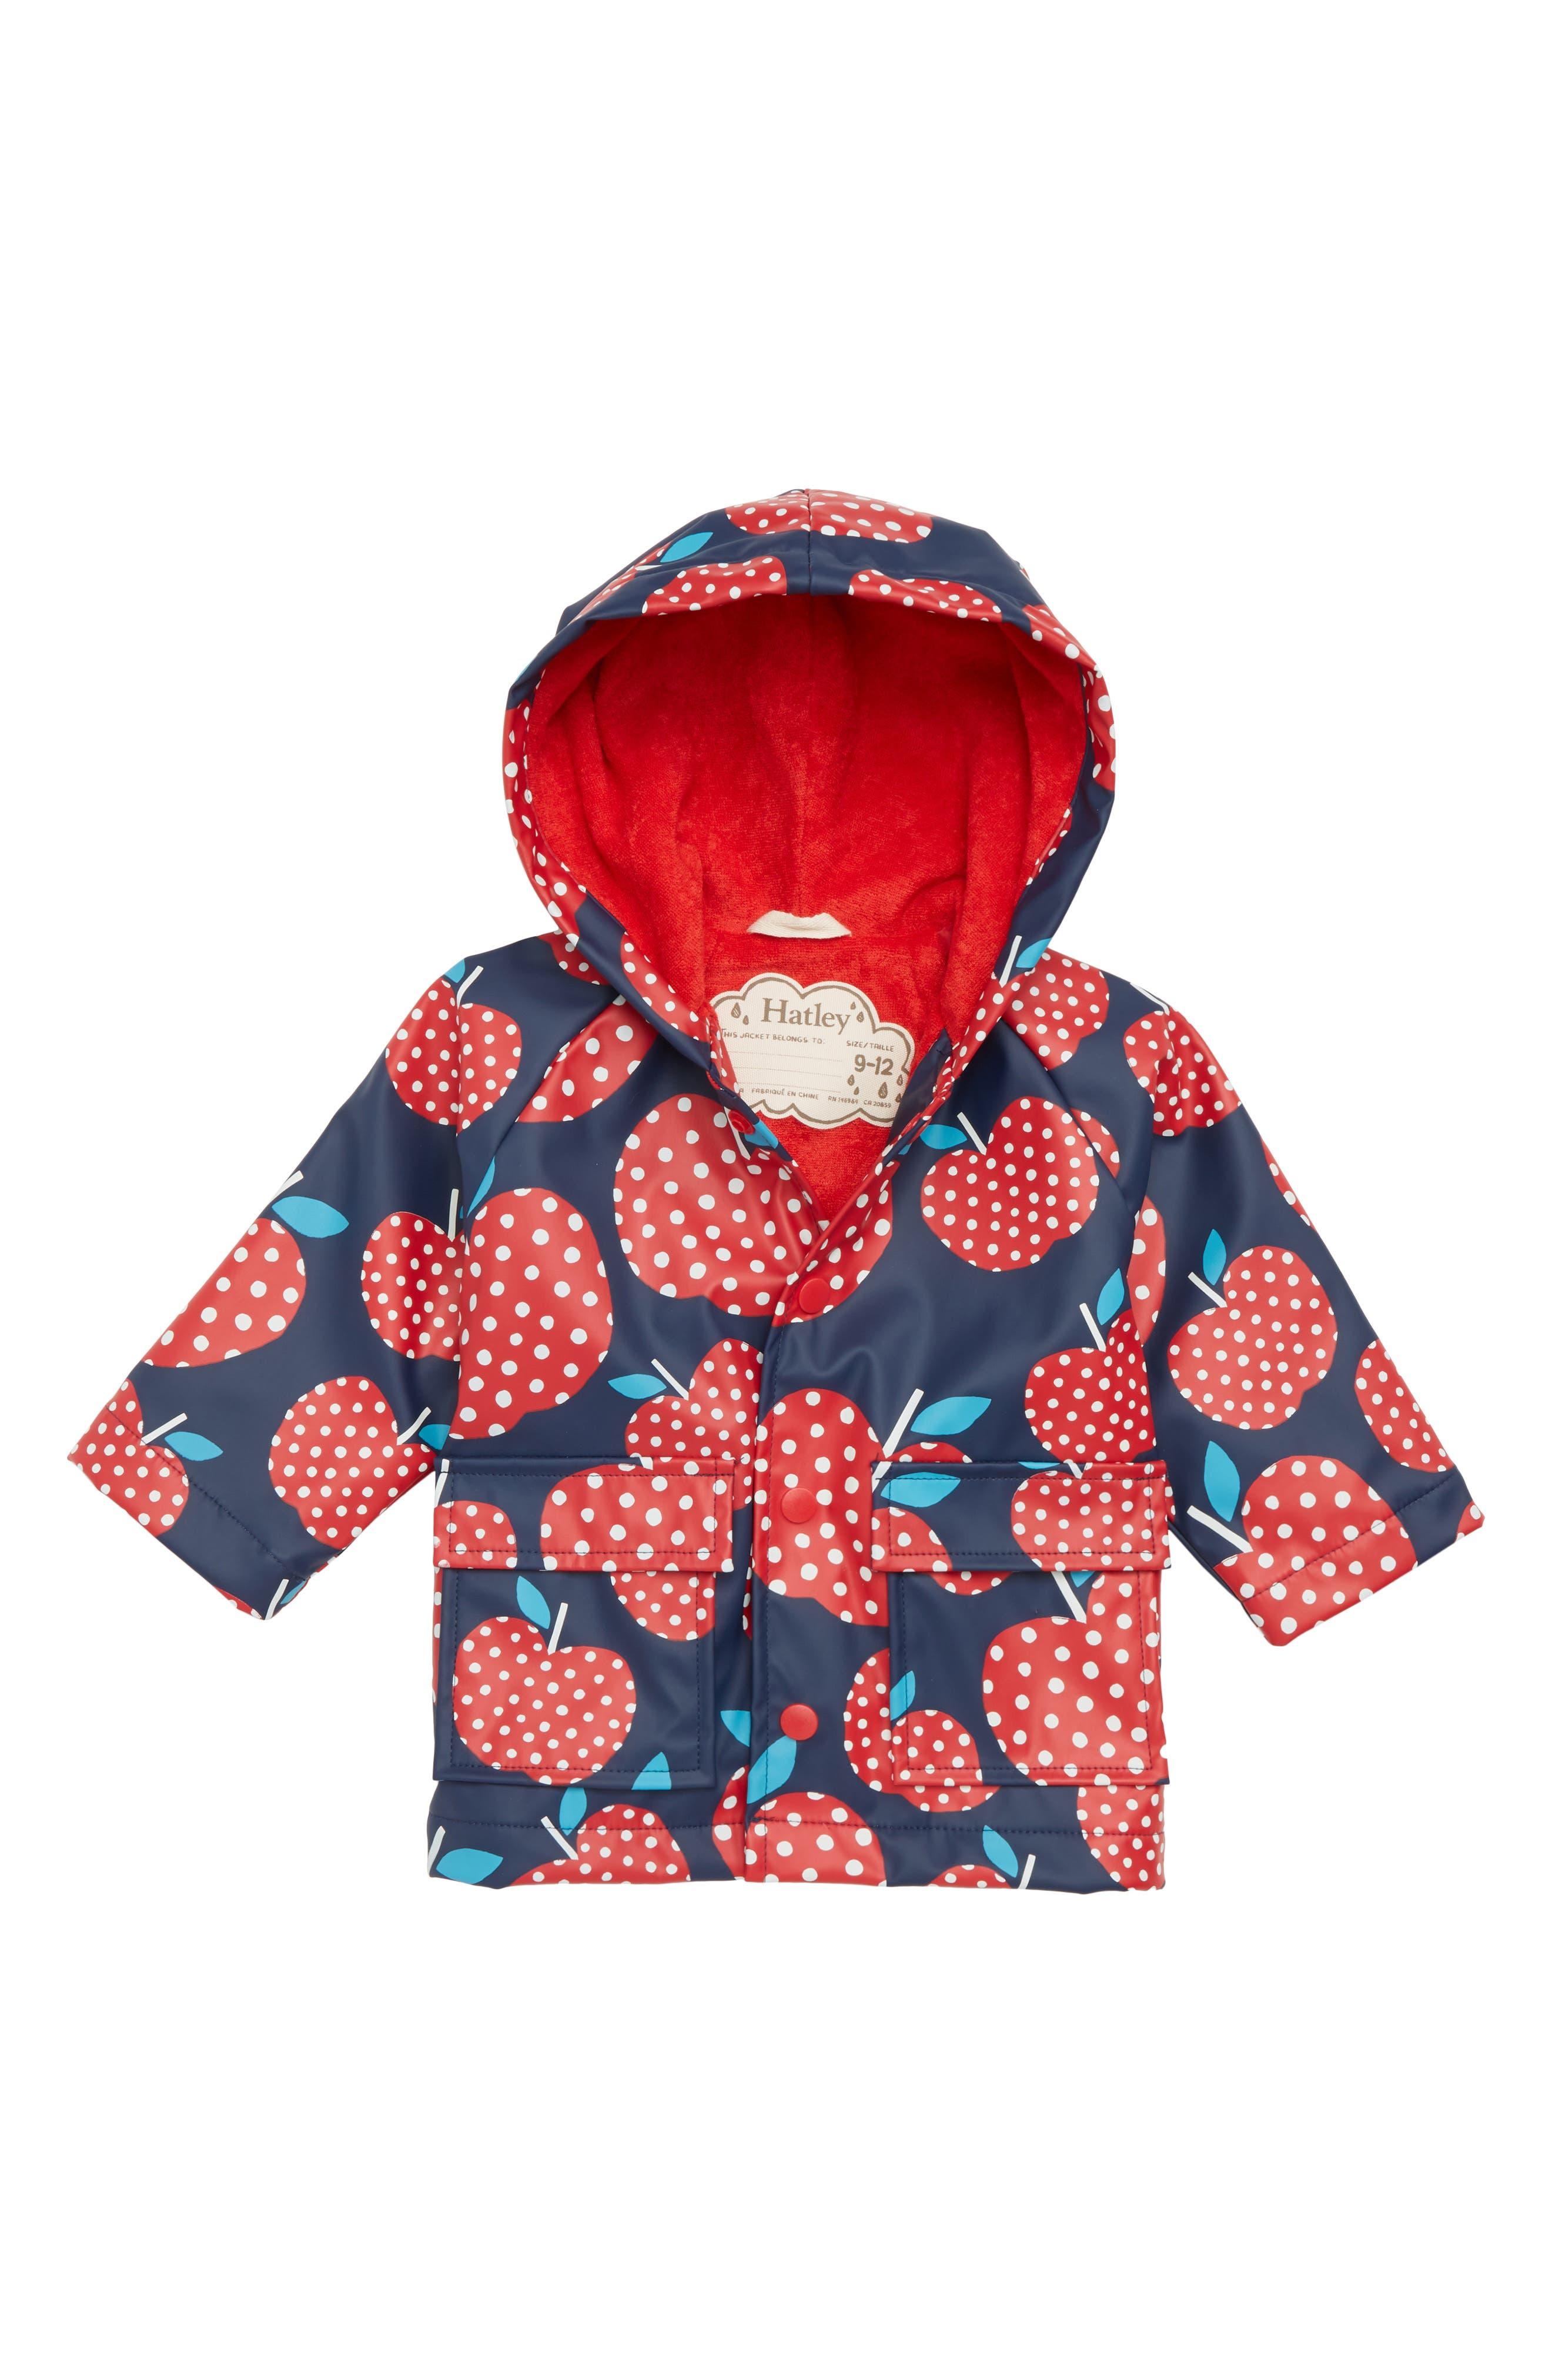 Polka Dot Apples Waterproof Hooded Raincoat,                             Main thumbnail 1, color,                             600